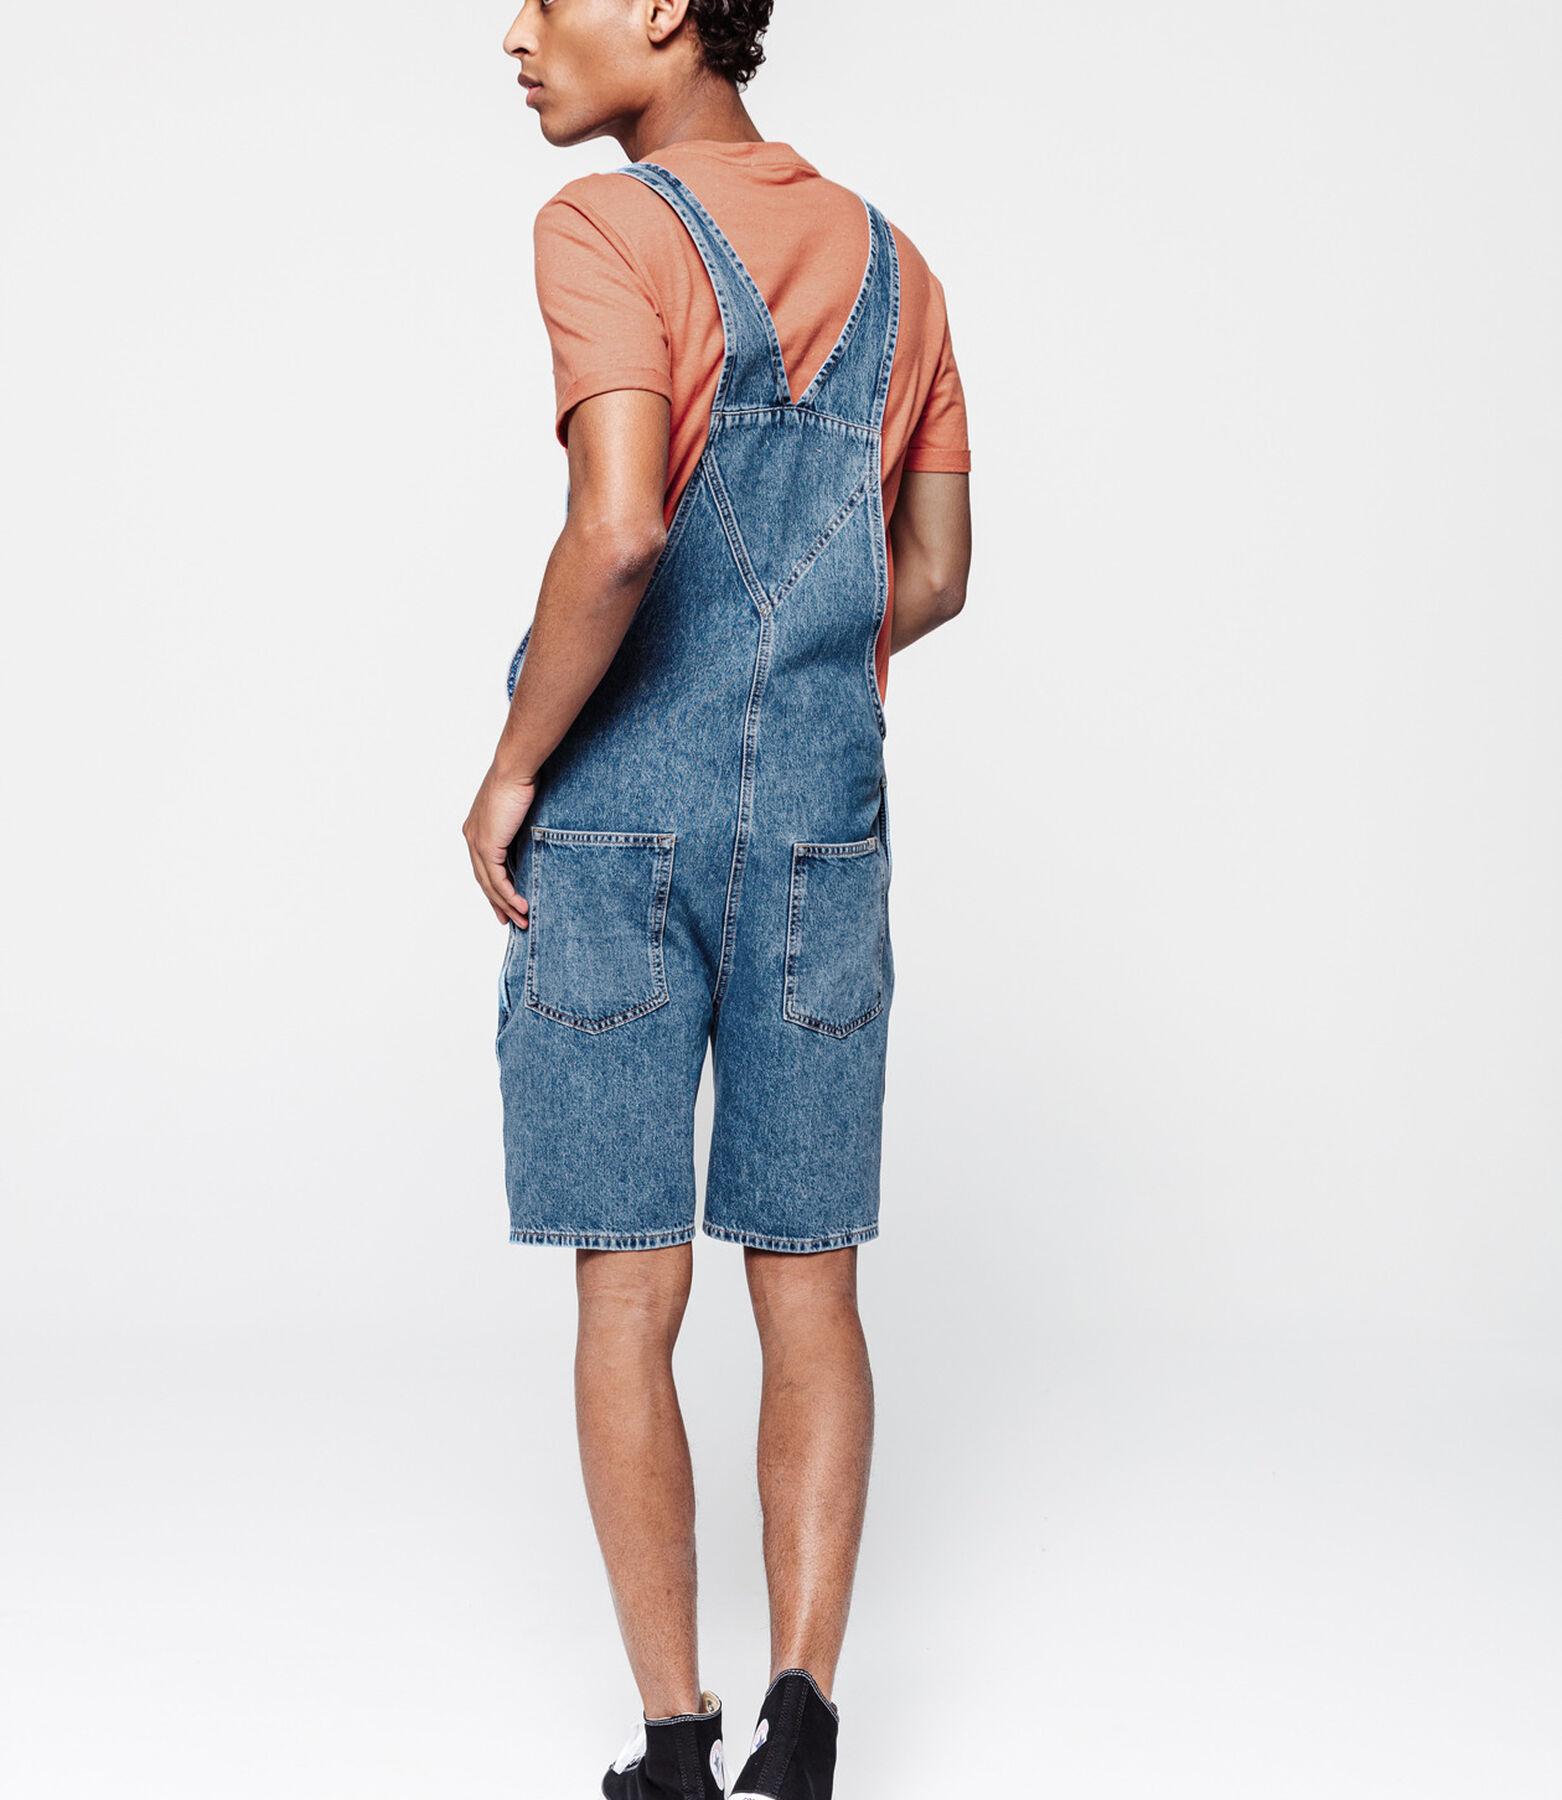 Salopette bermuda en jean, recyclé